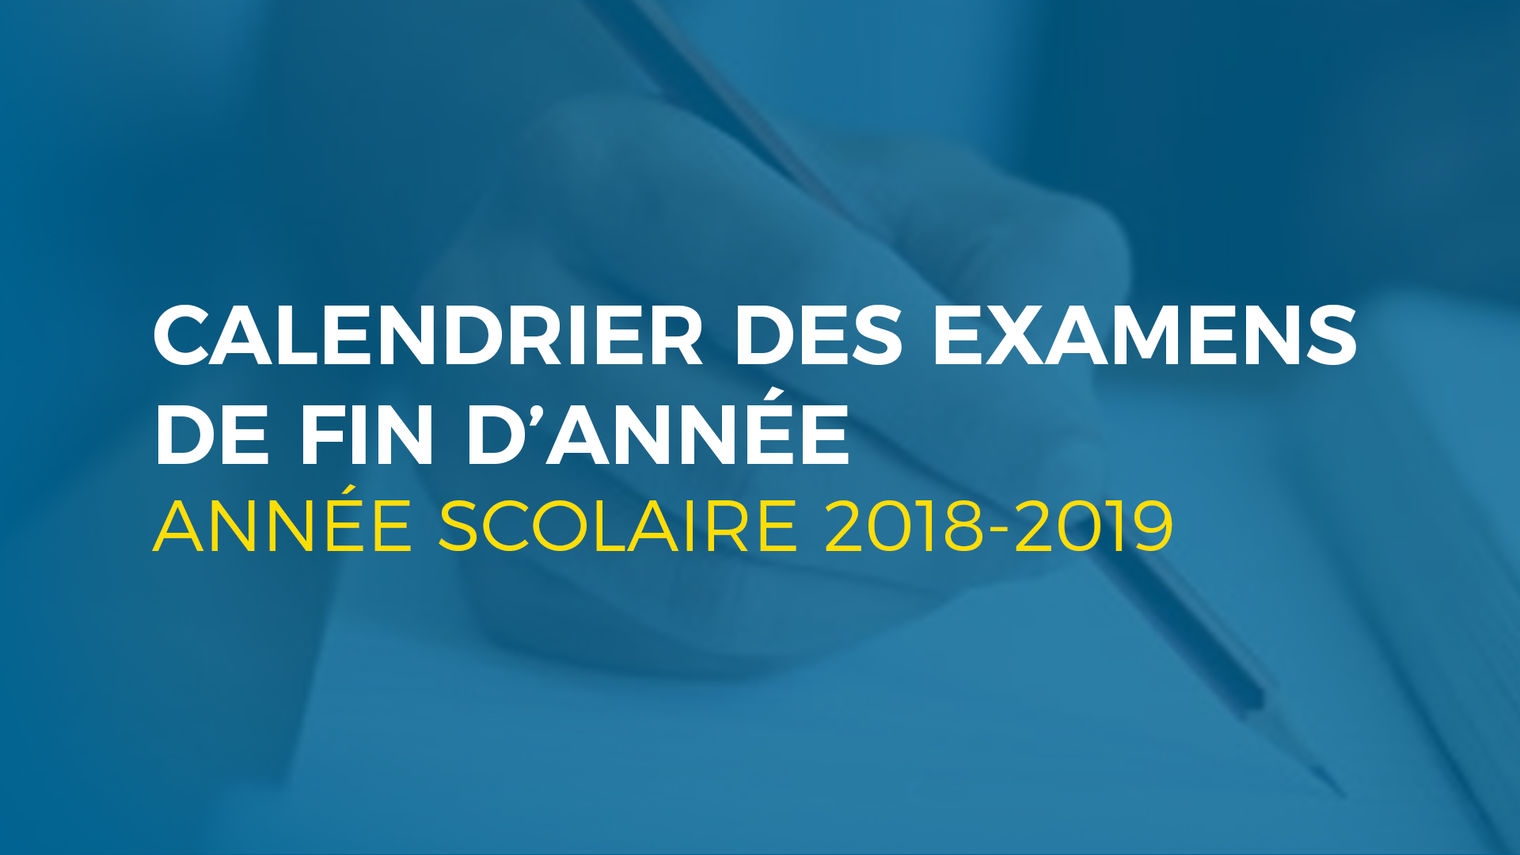 Julien Delmas Calendrier.Calendrier Salaire Prof